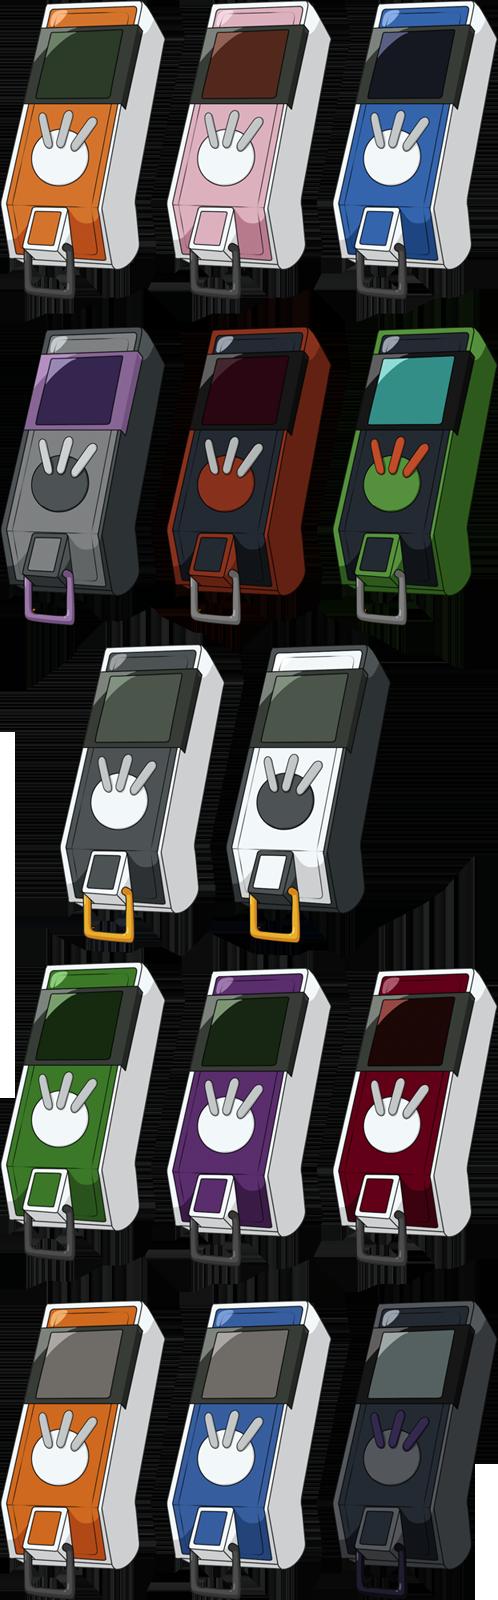 La Tienda de Armas Digimon_savers_next___all_digivice_ic_hd___lines_by_nelanequin-d7uy8s5